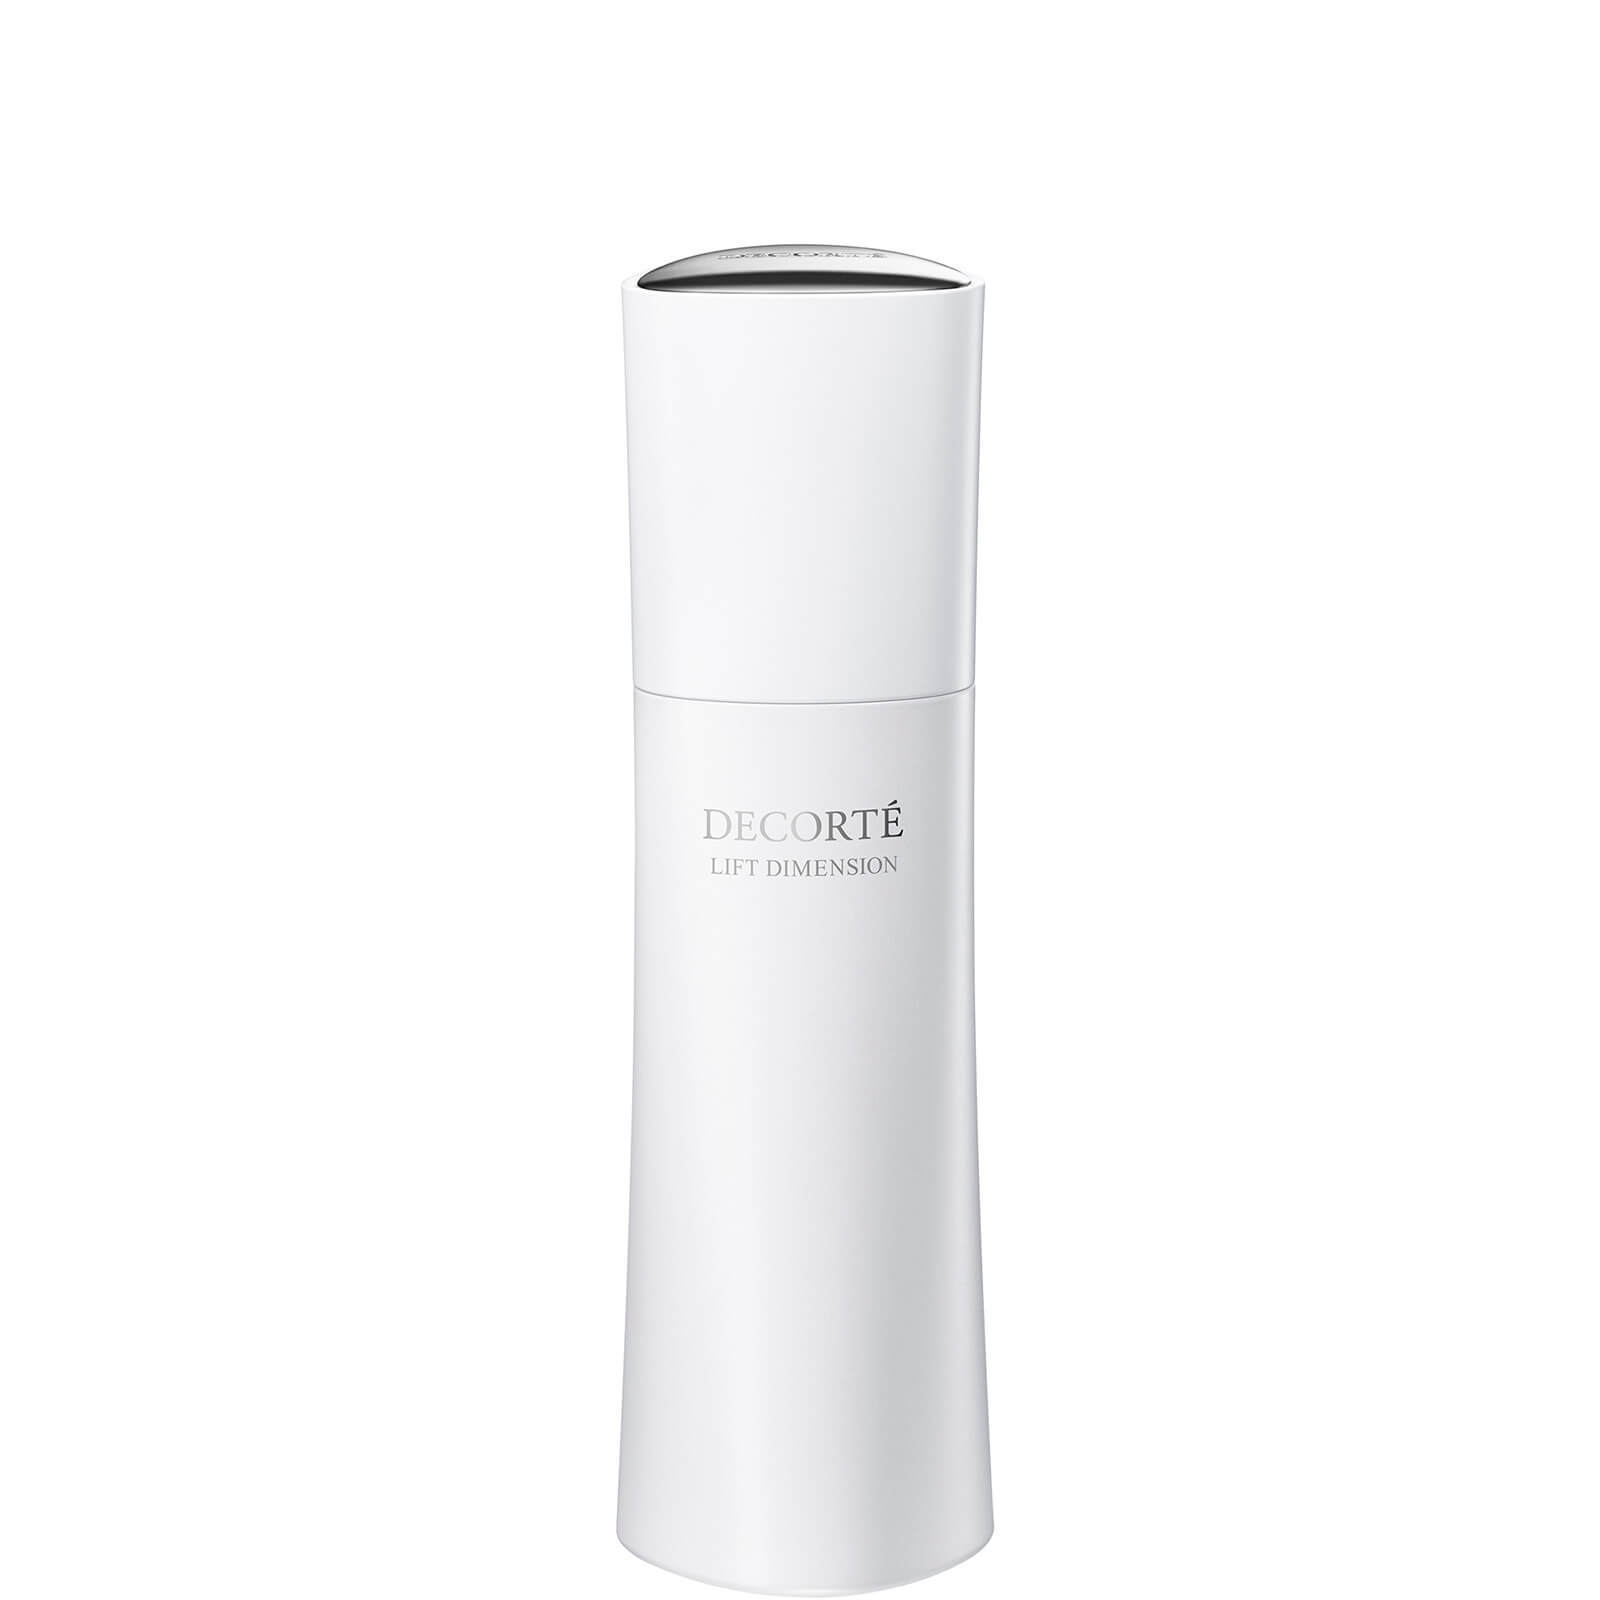 Купить Decorté Lift Dimension Brighten and Plump Emulsion 200ml